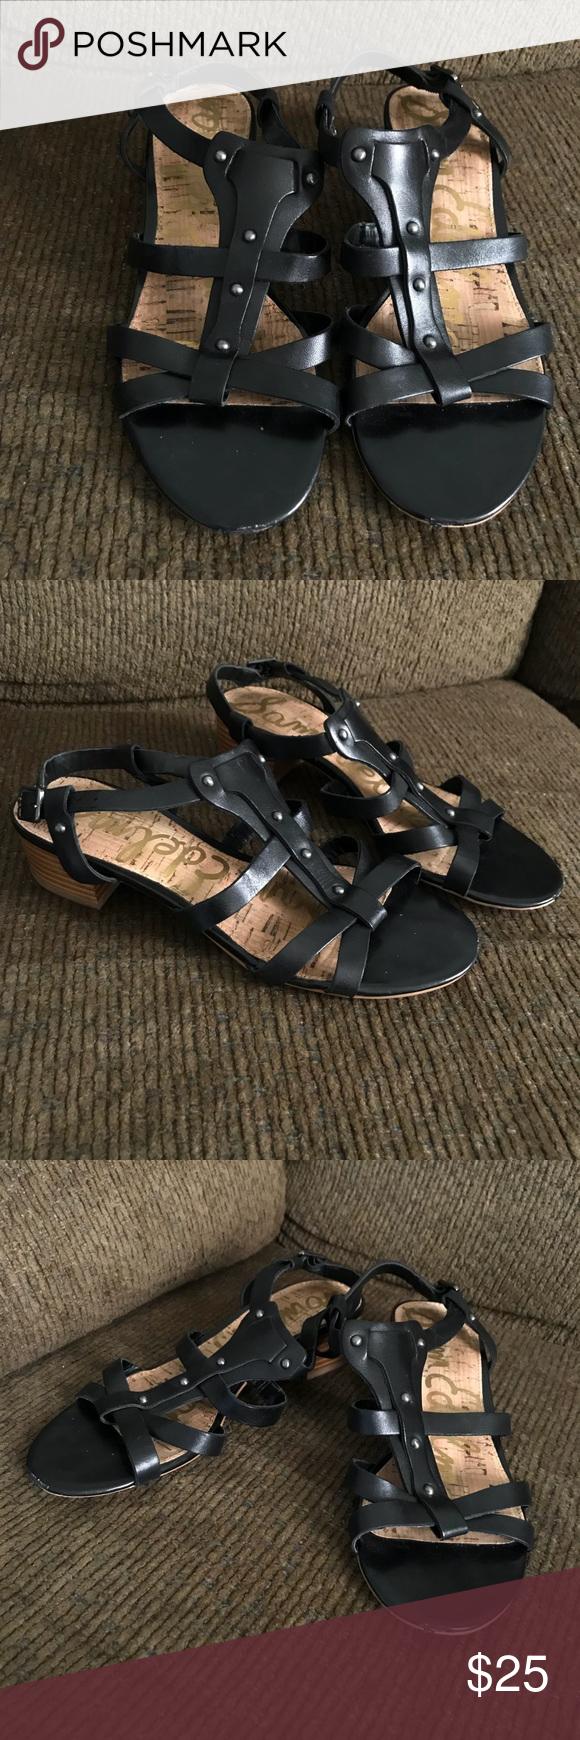 e755fa33fb9d7 Sz 7.5 Black Sam Edelman Angela Strappy Sandals